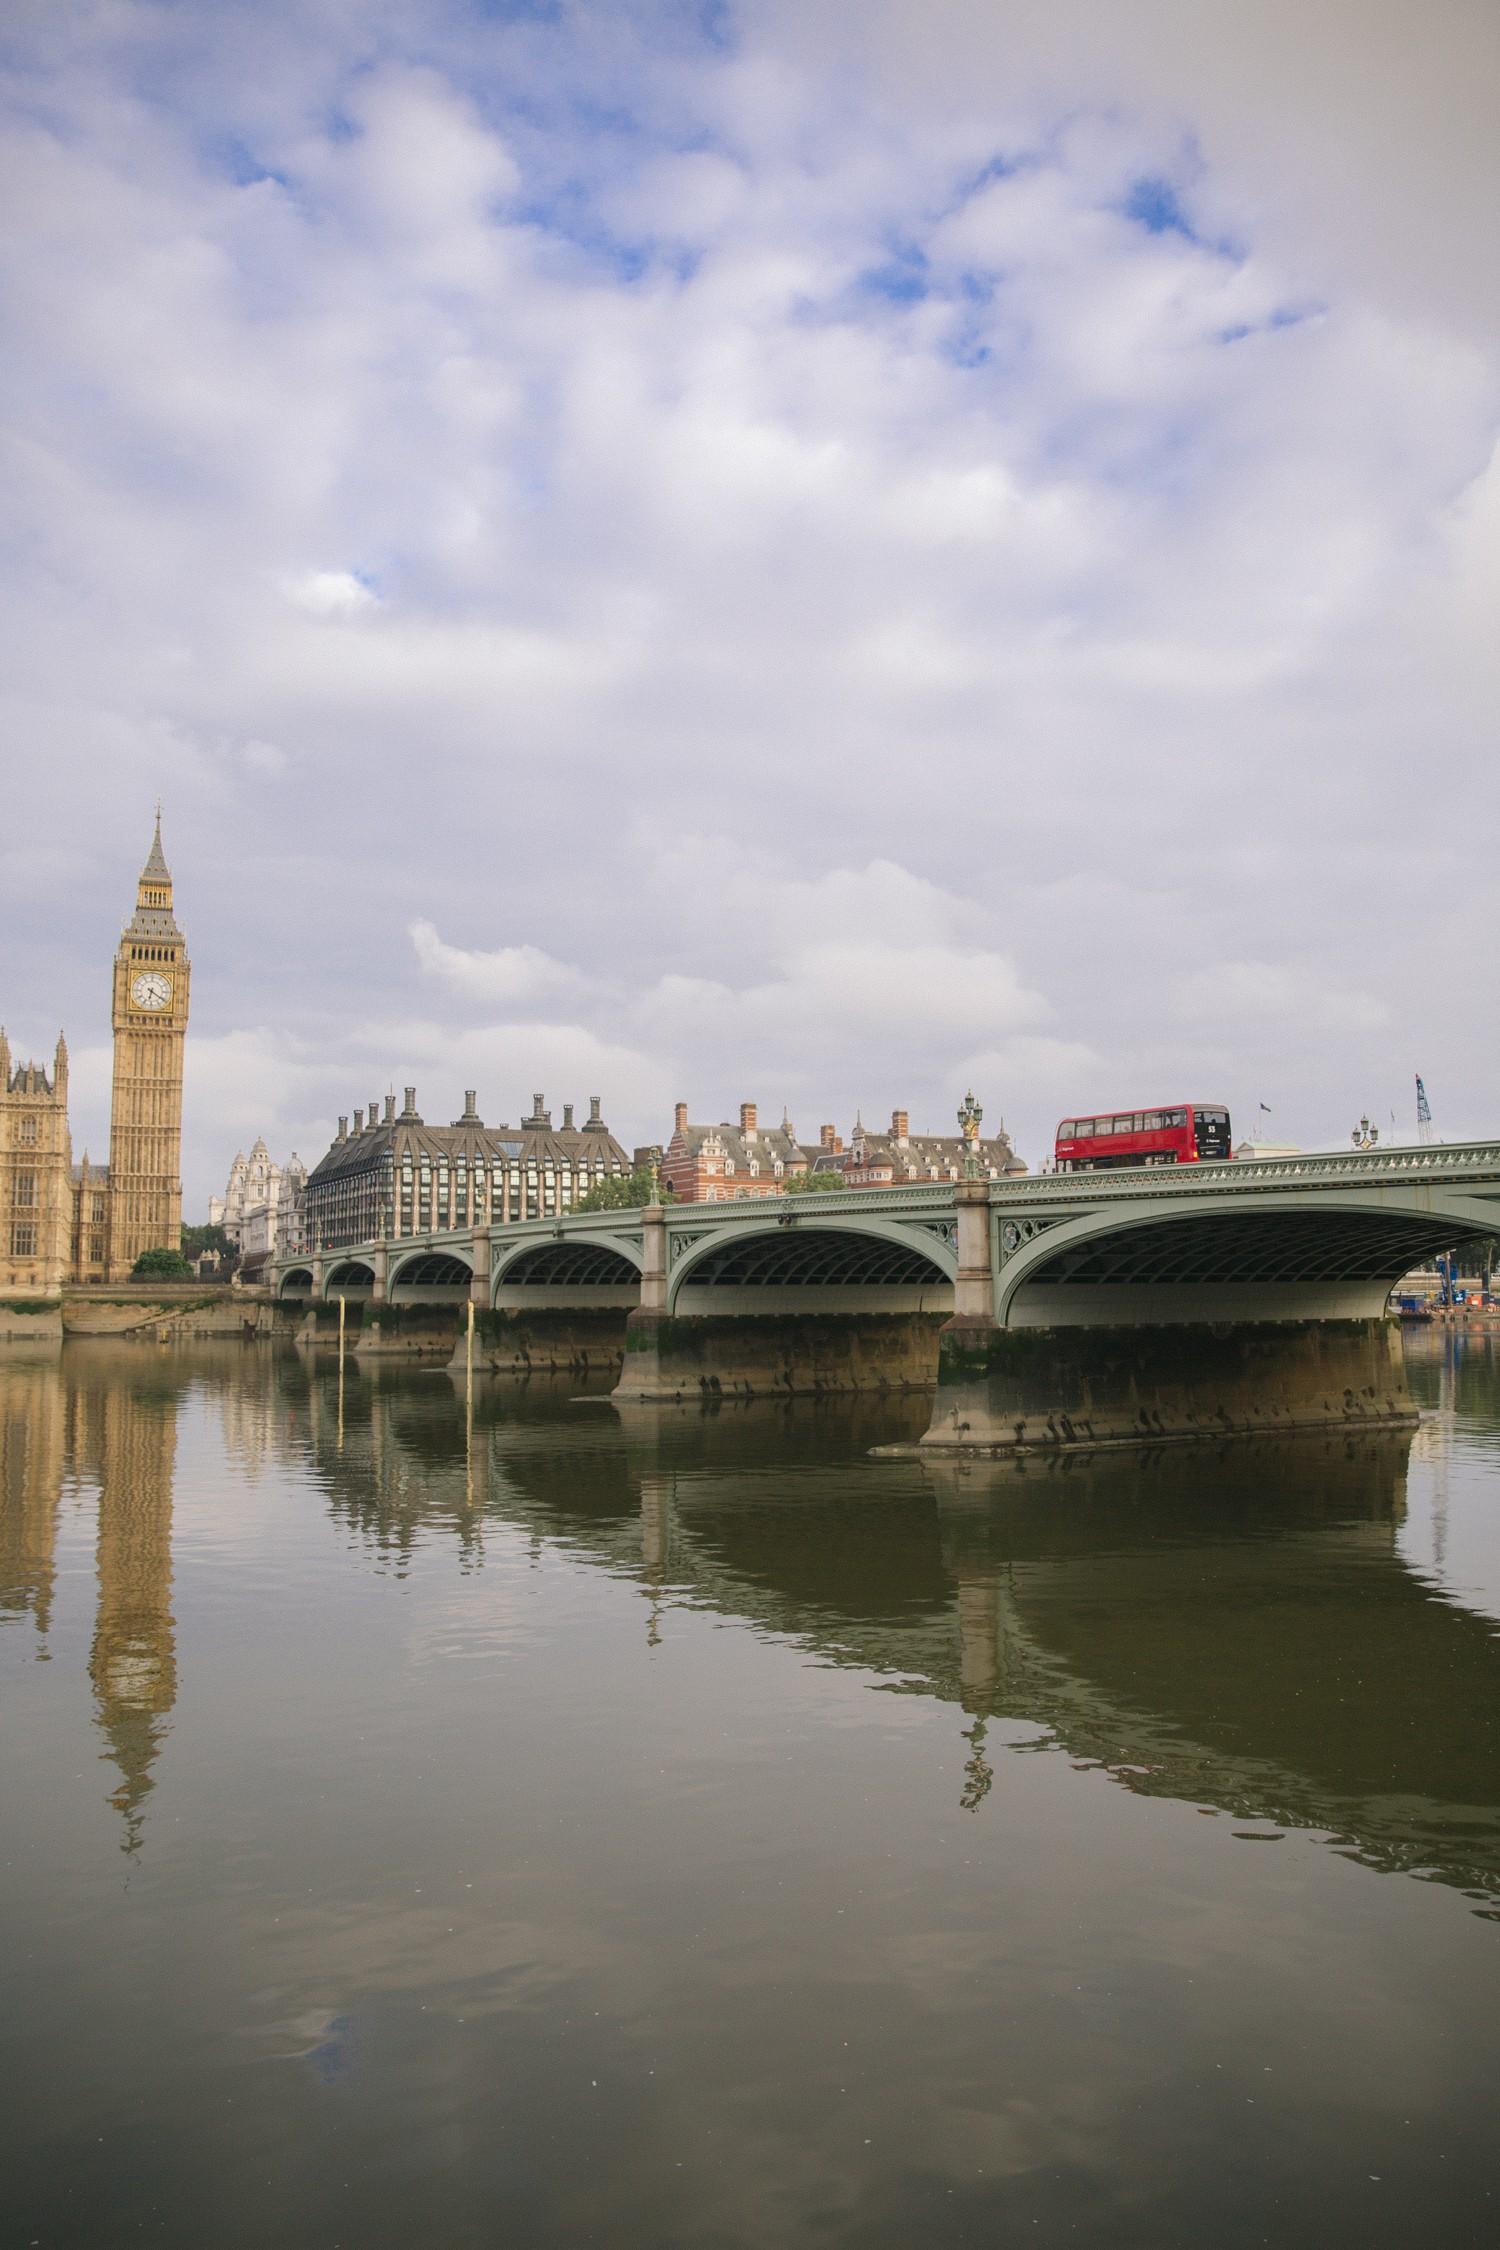 Red Bus on Westminster Bridge